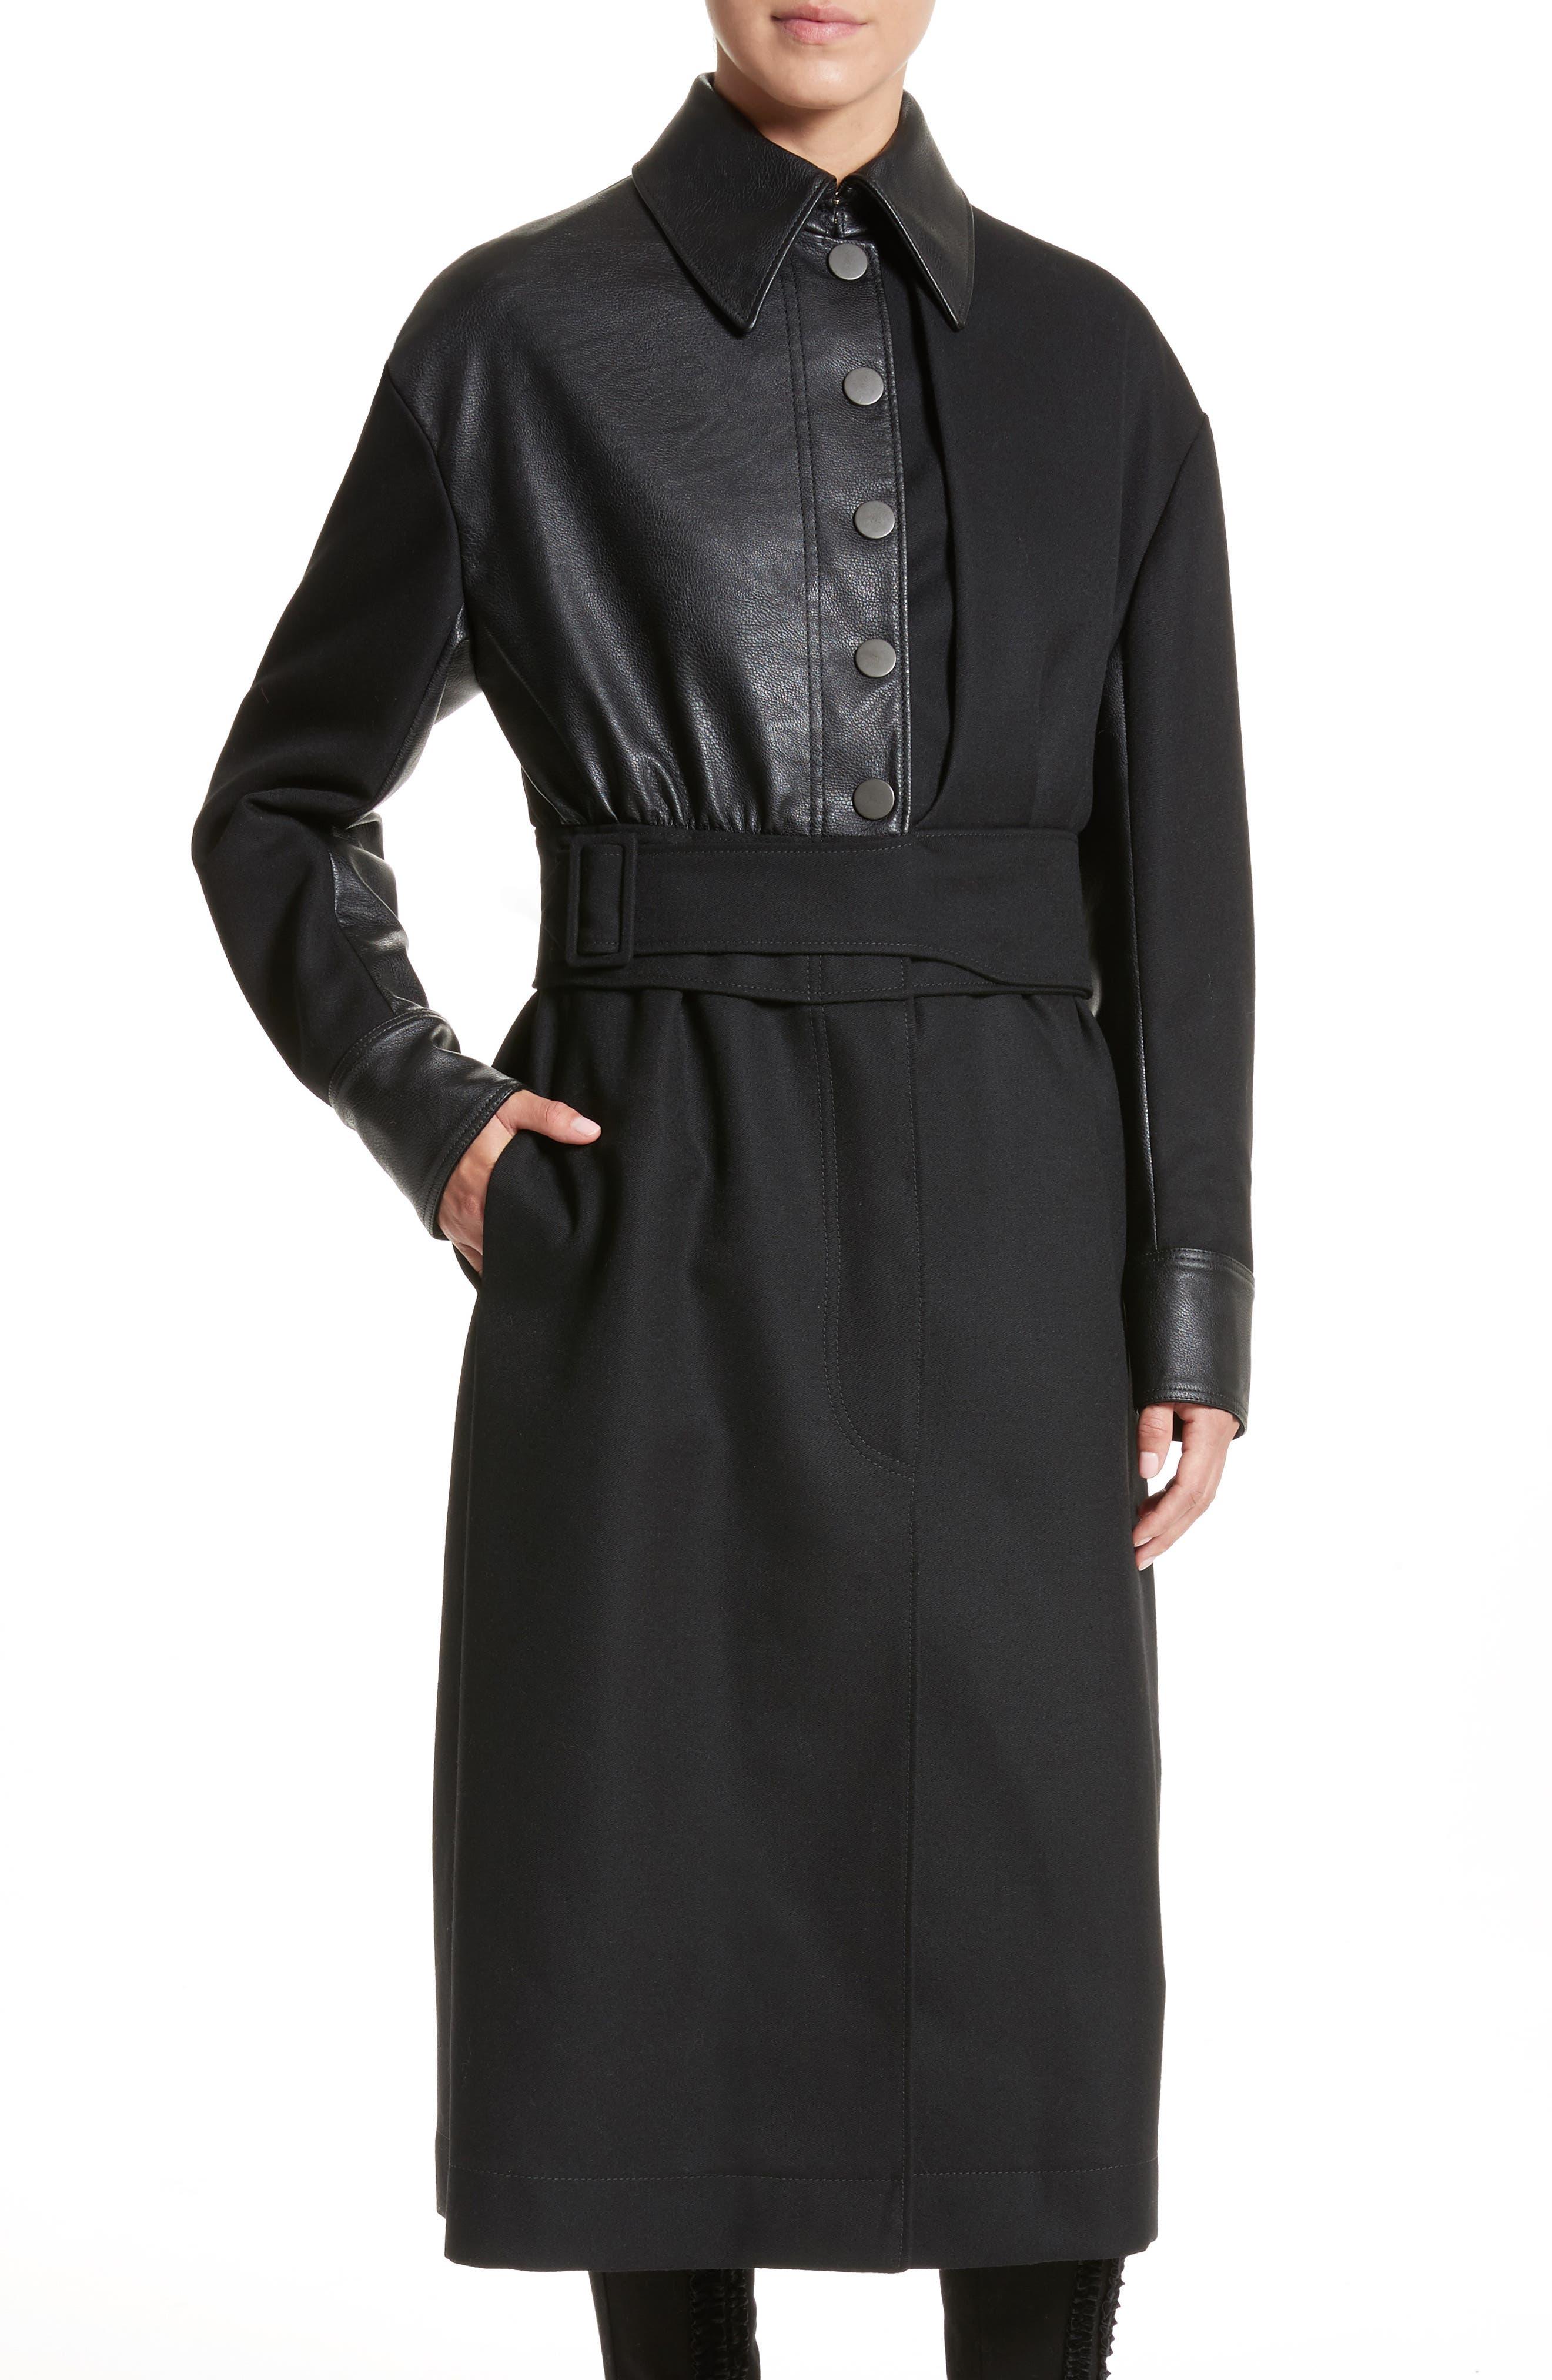 Eden Alter Leather Trim Wool Coat,                             Alternate thumbnail 4, color,                             001